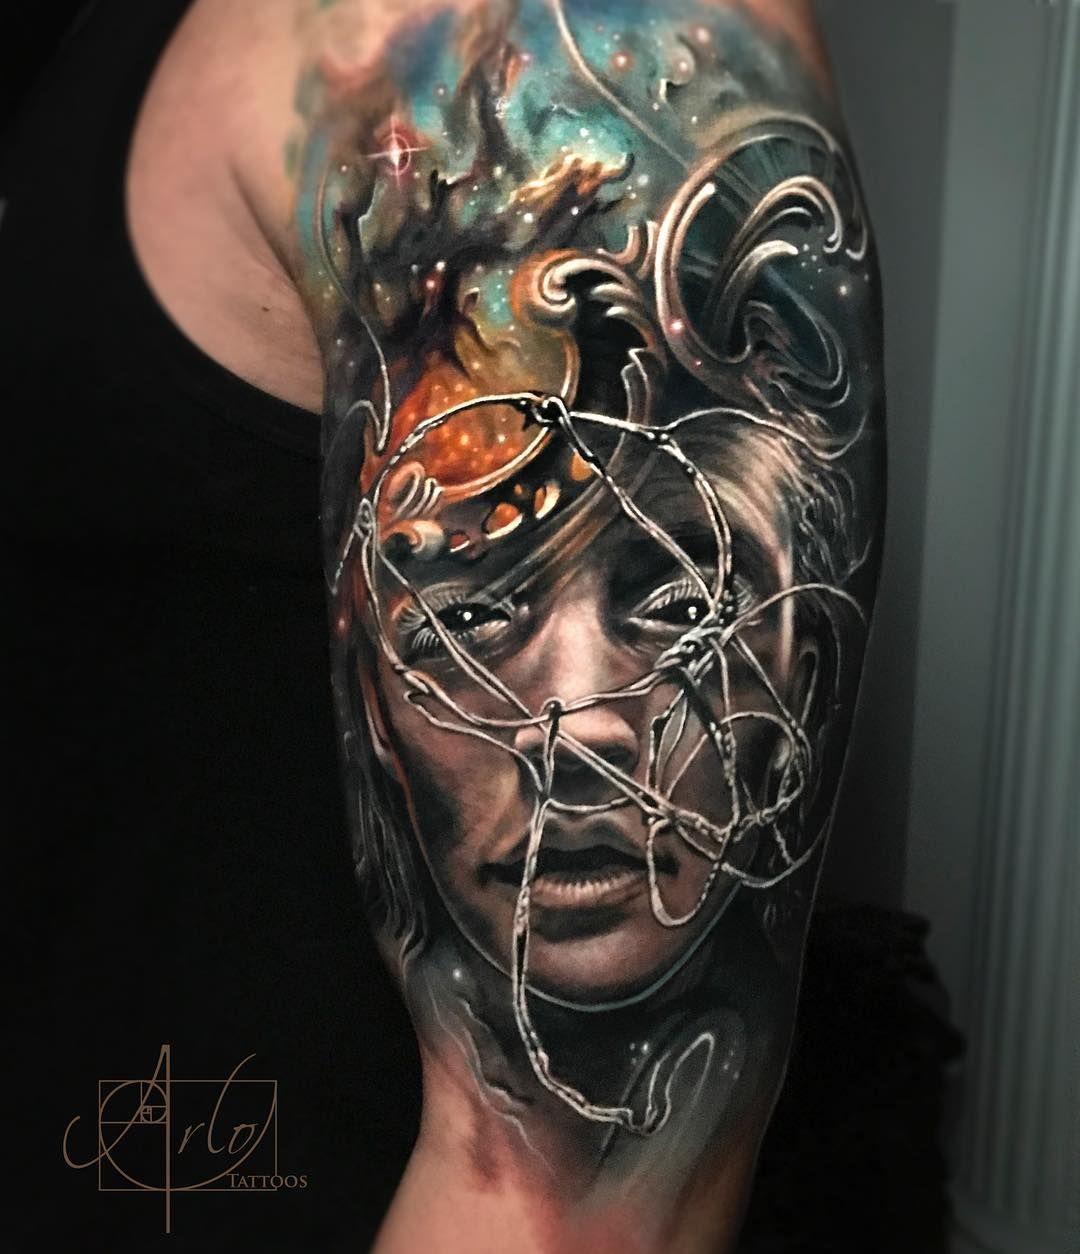 Arlo Dicristina Tattoo Artist: Morphing Tattoo By Arlo DiCristina